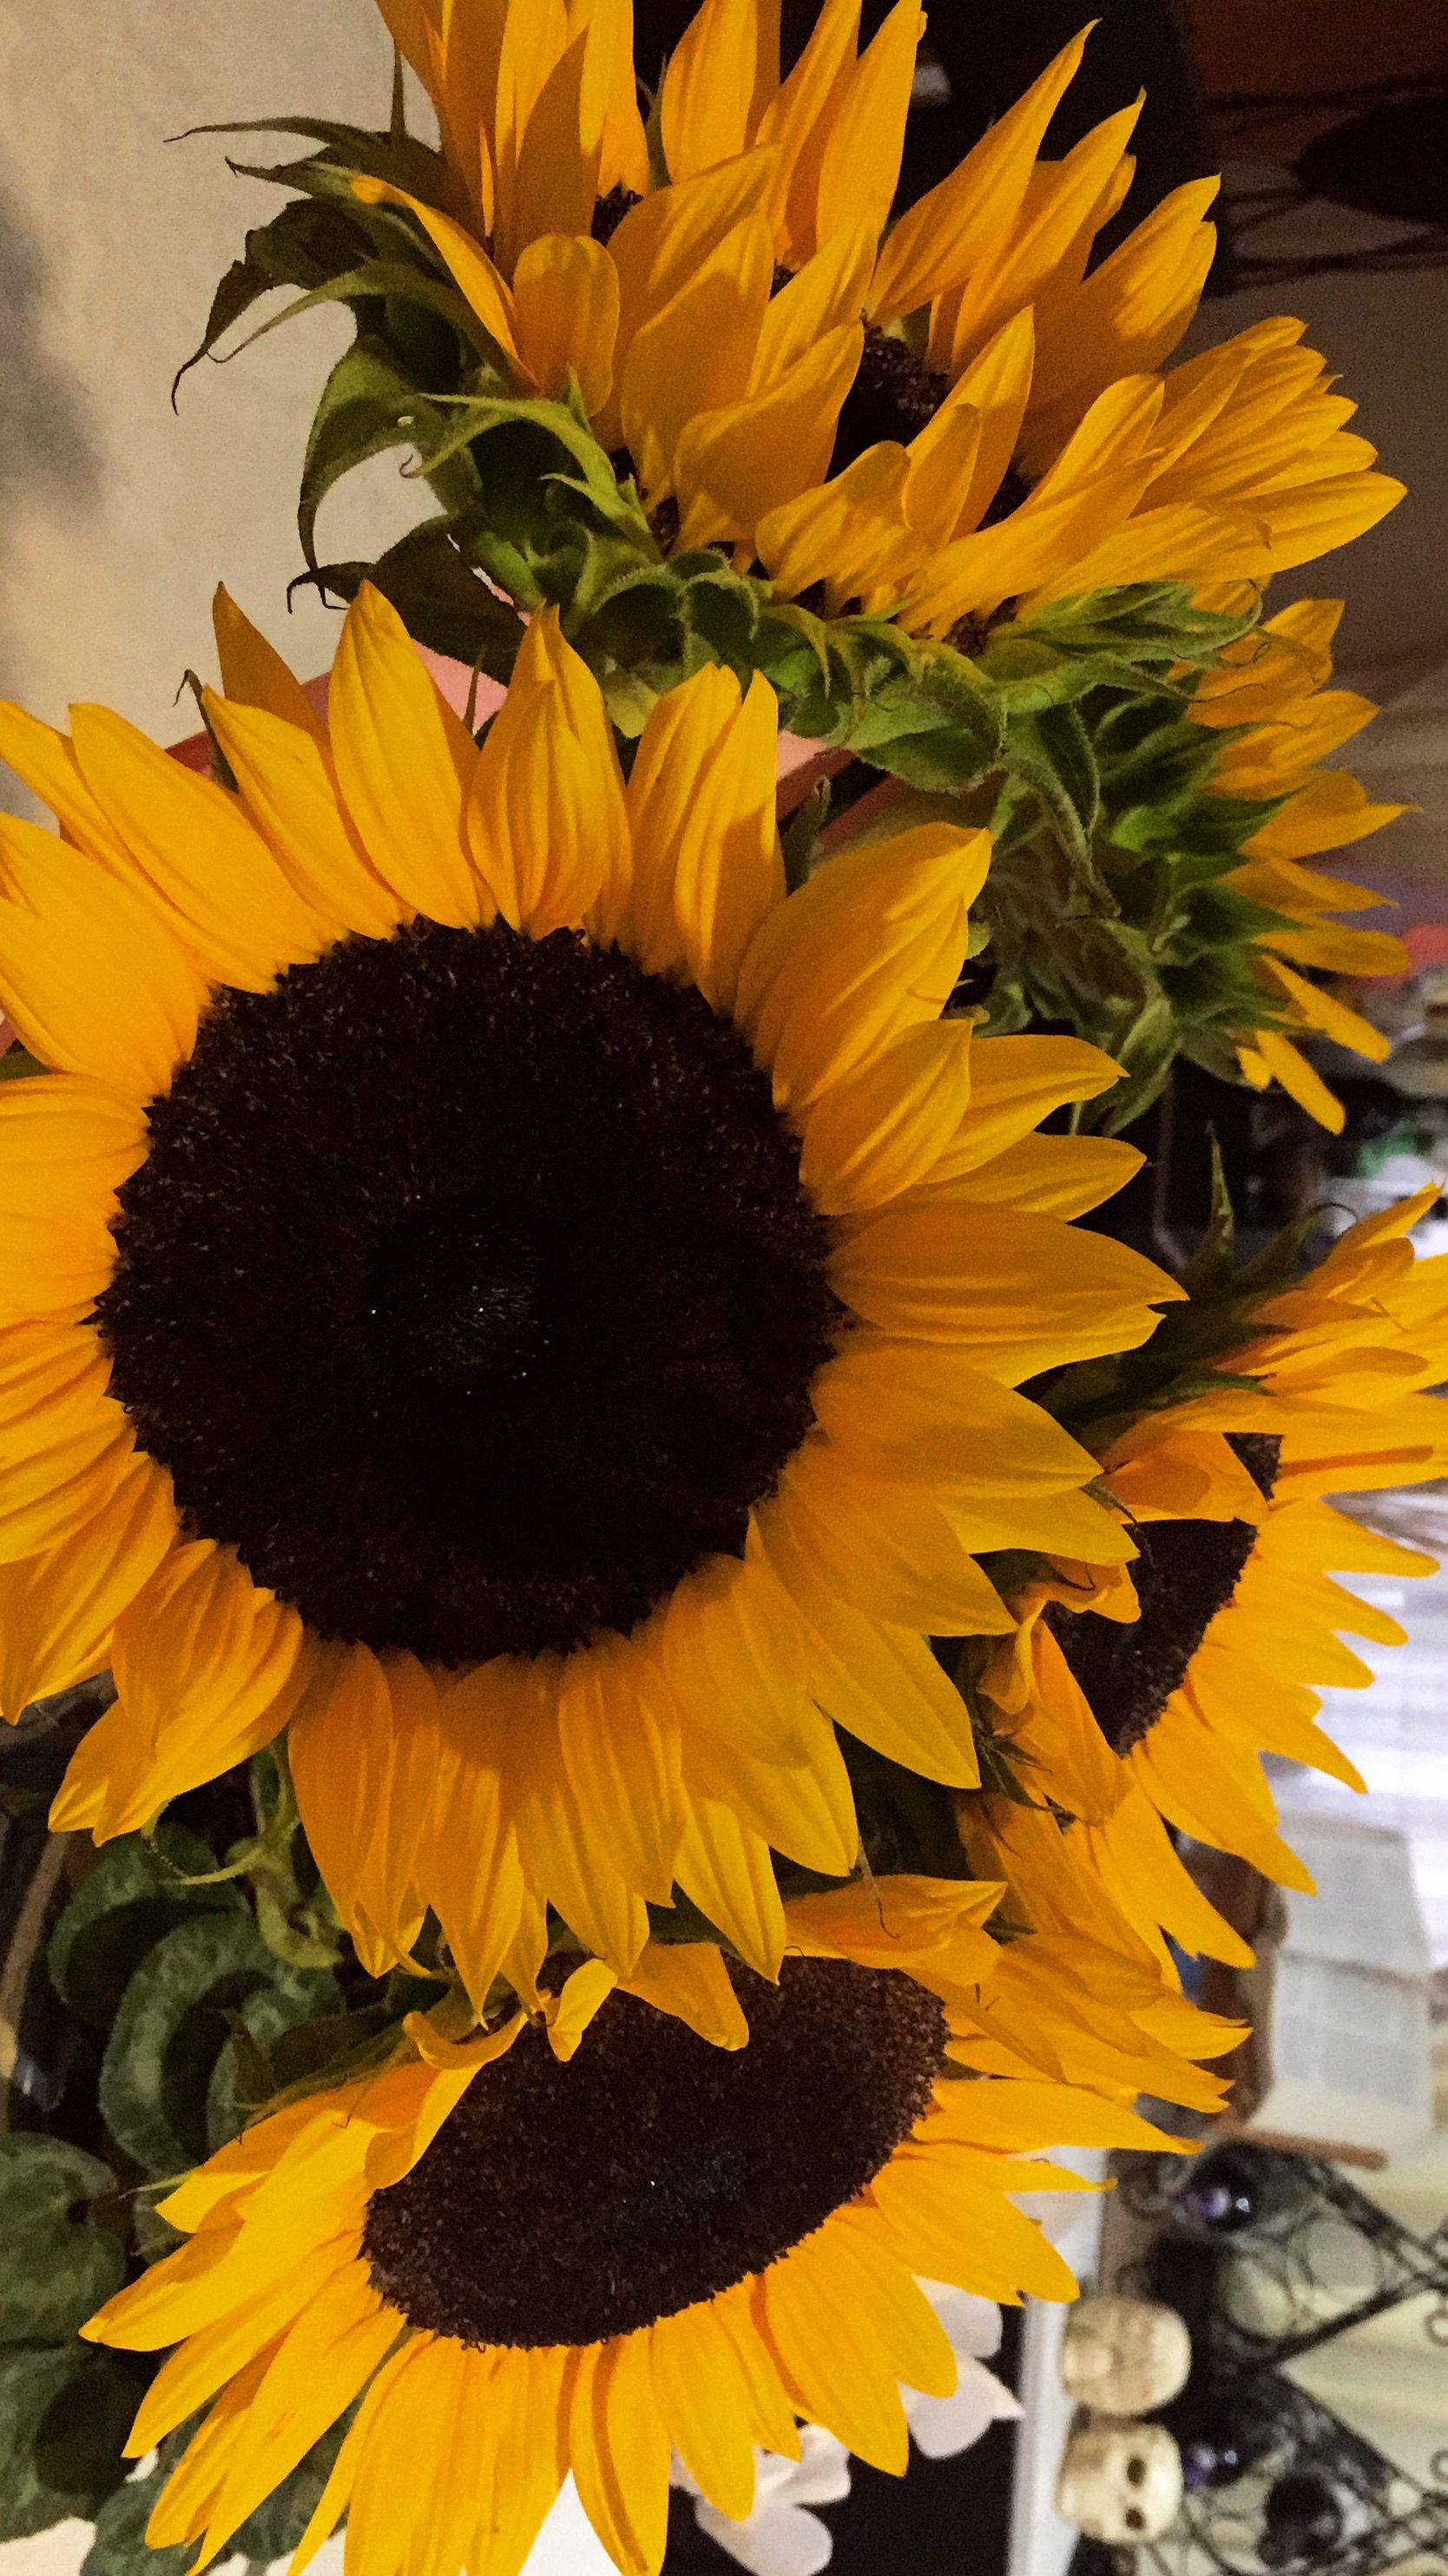 ꮲɪɴᴛᴇʀᴇsᴛ Sɴᴇᴀᴋᴇʀ ʙᴀᴇ Sunflower Wallpaper